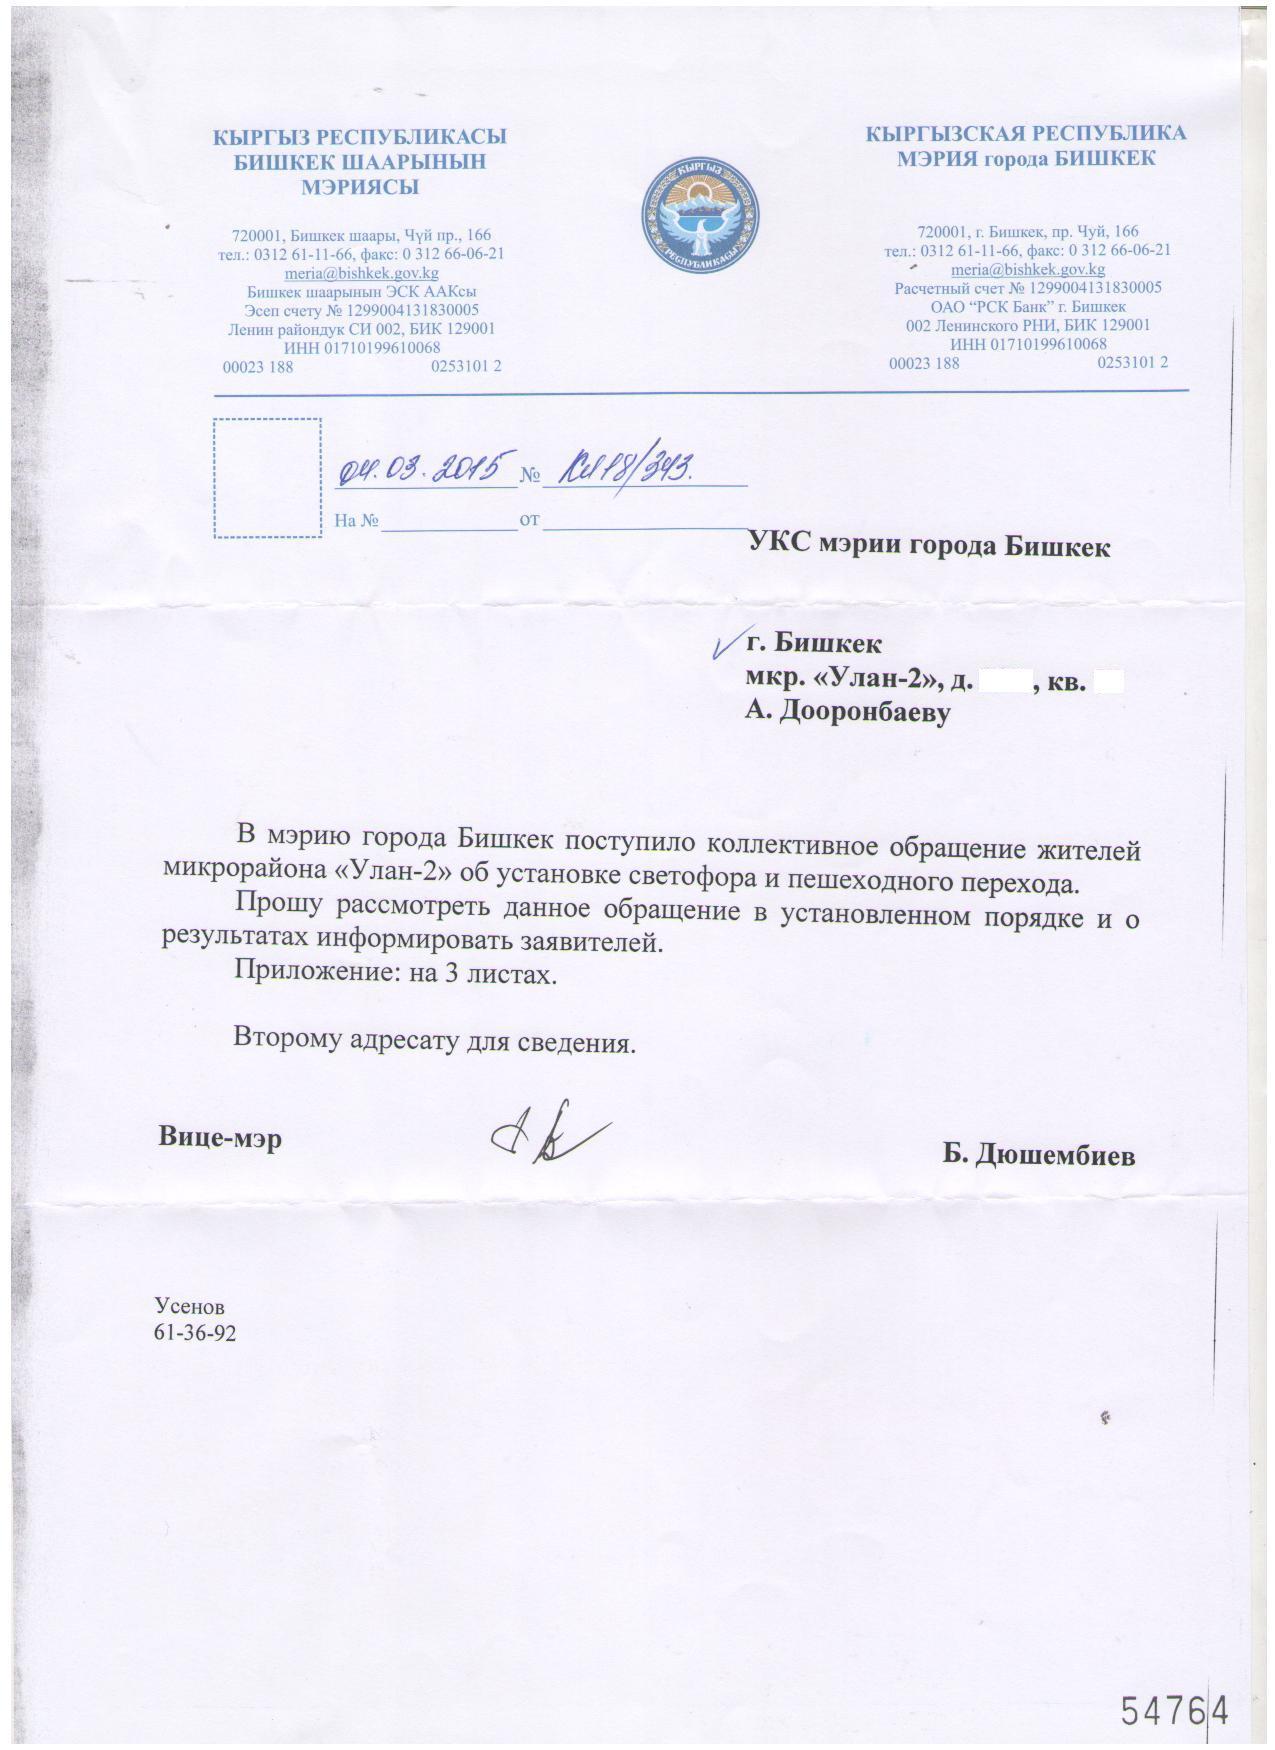 Образец письма мэру москвы enverbbui's blog.